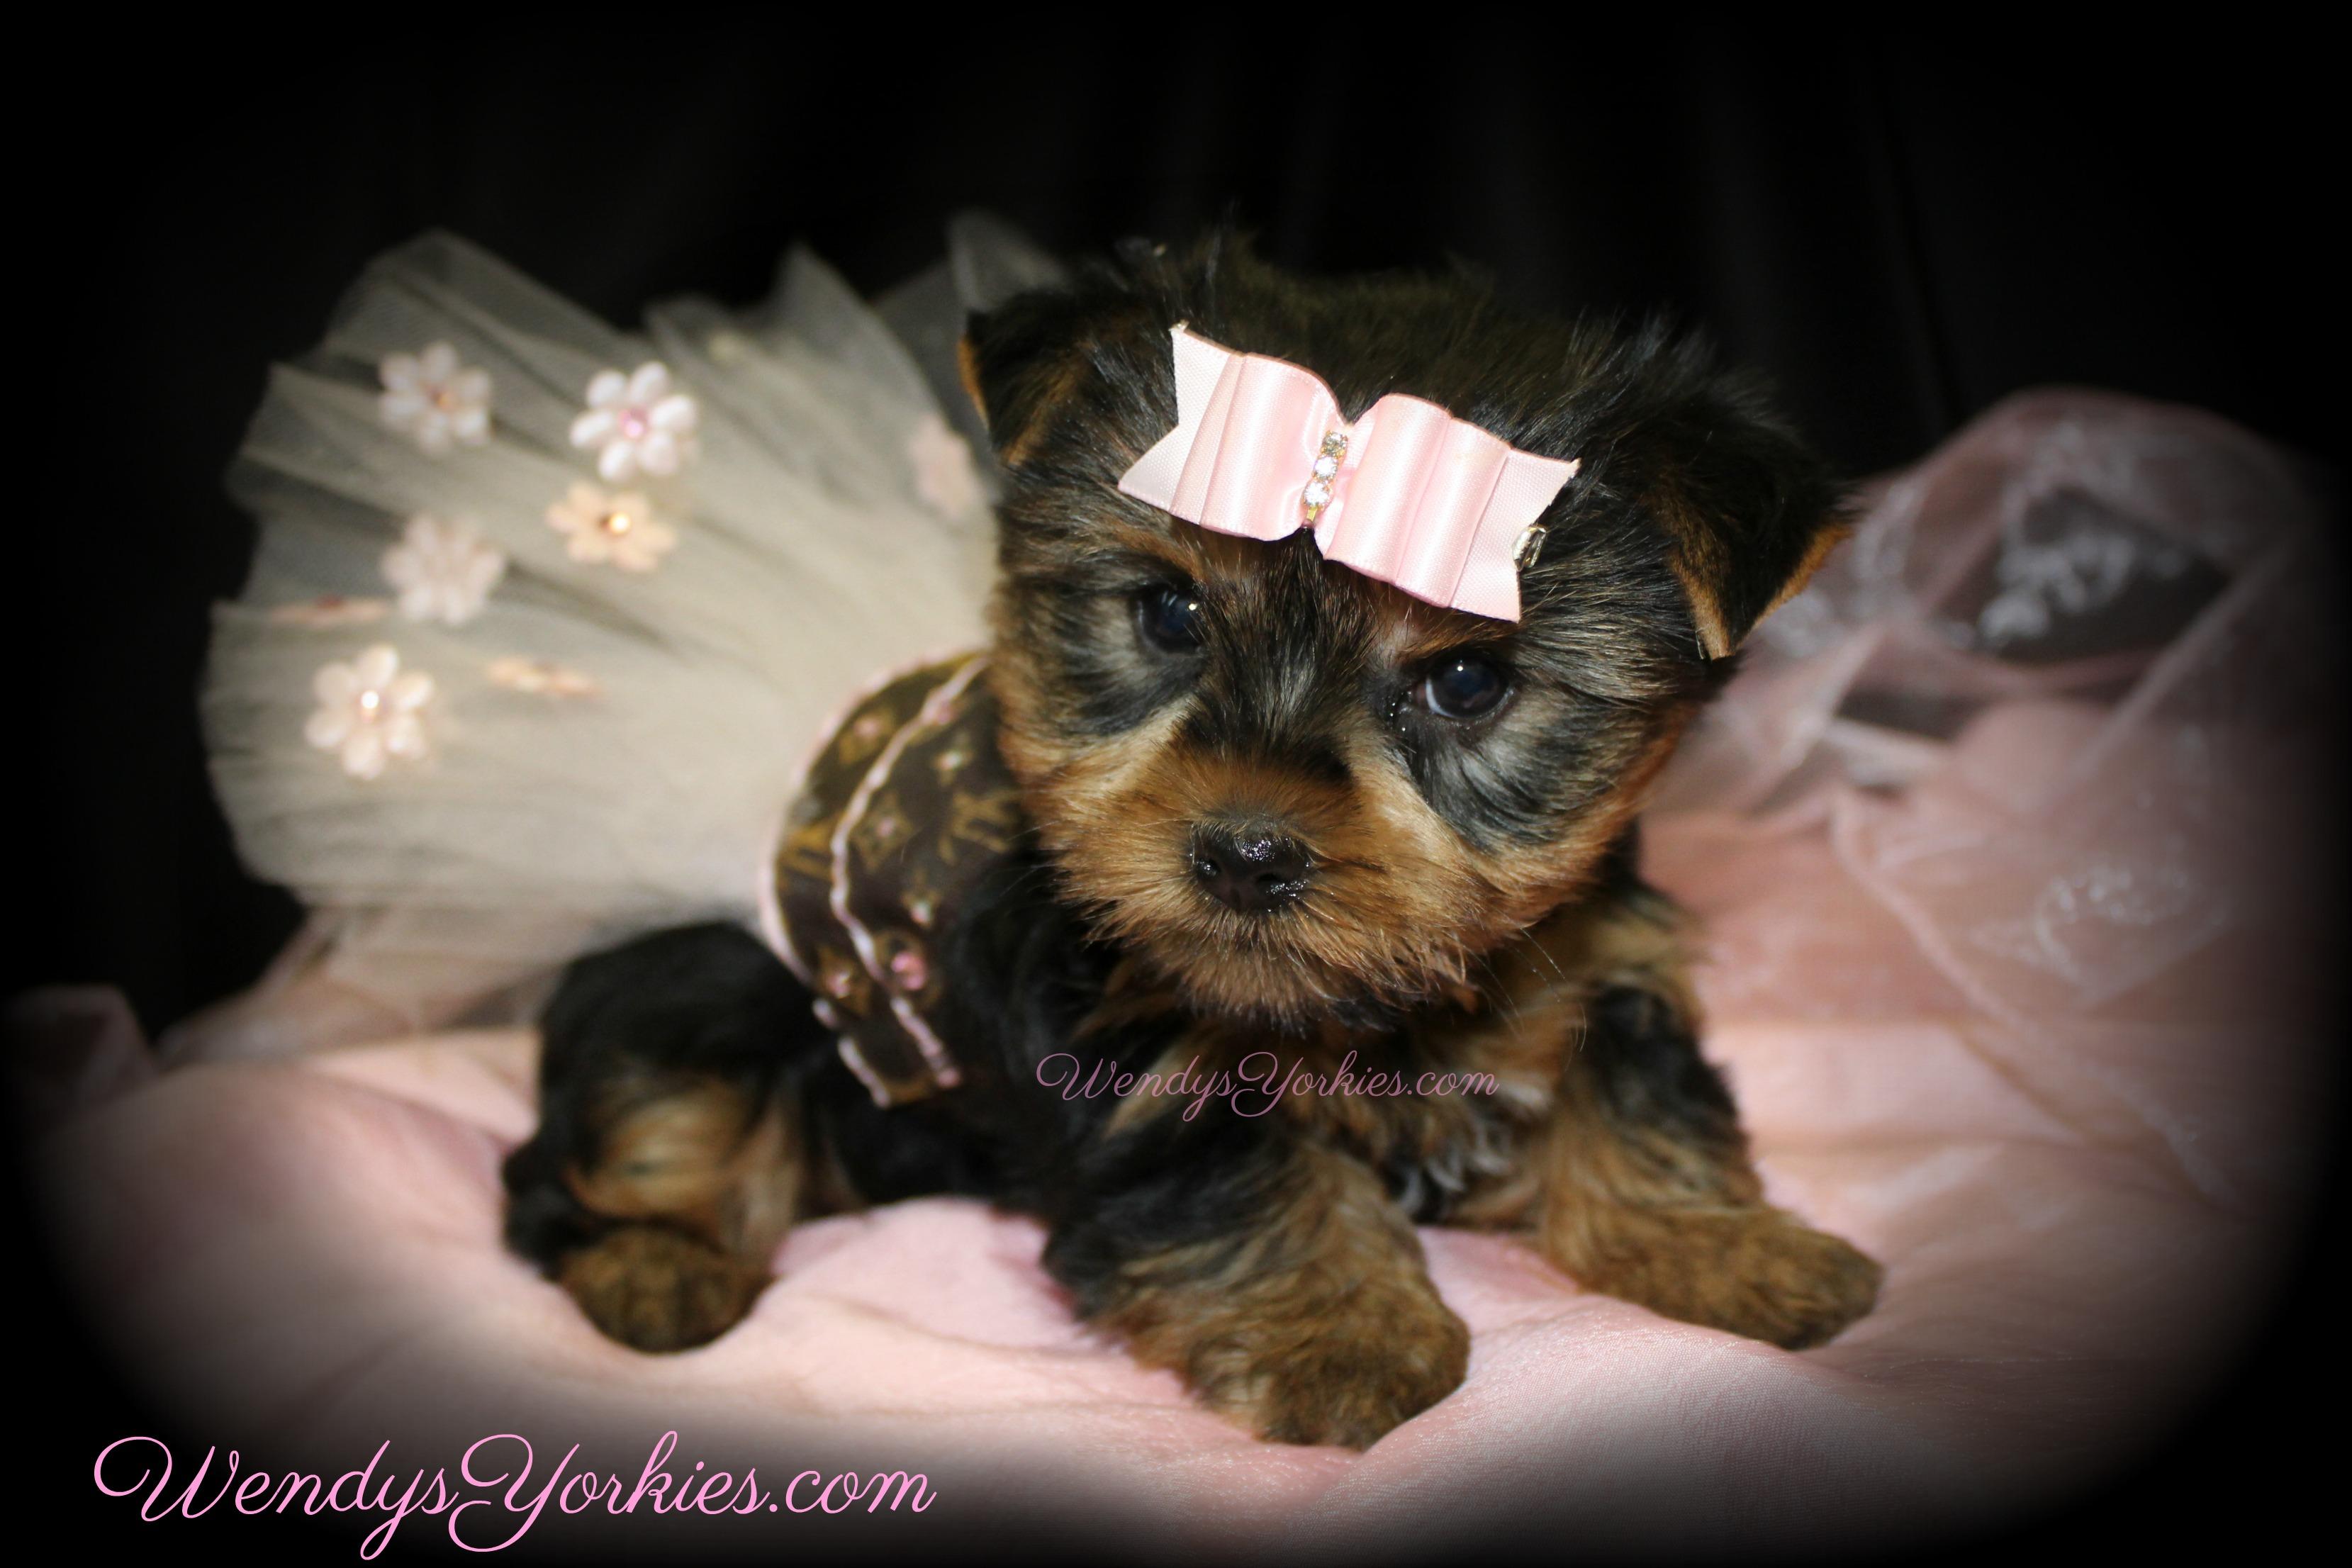 Teacup Female Yorkie puppy for sale, WendysYorkies.com, Star f1